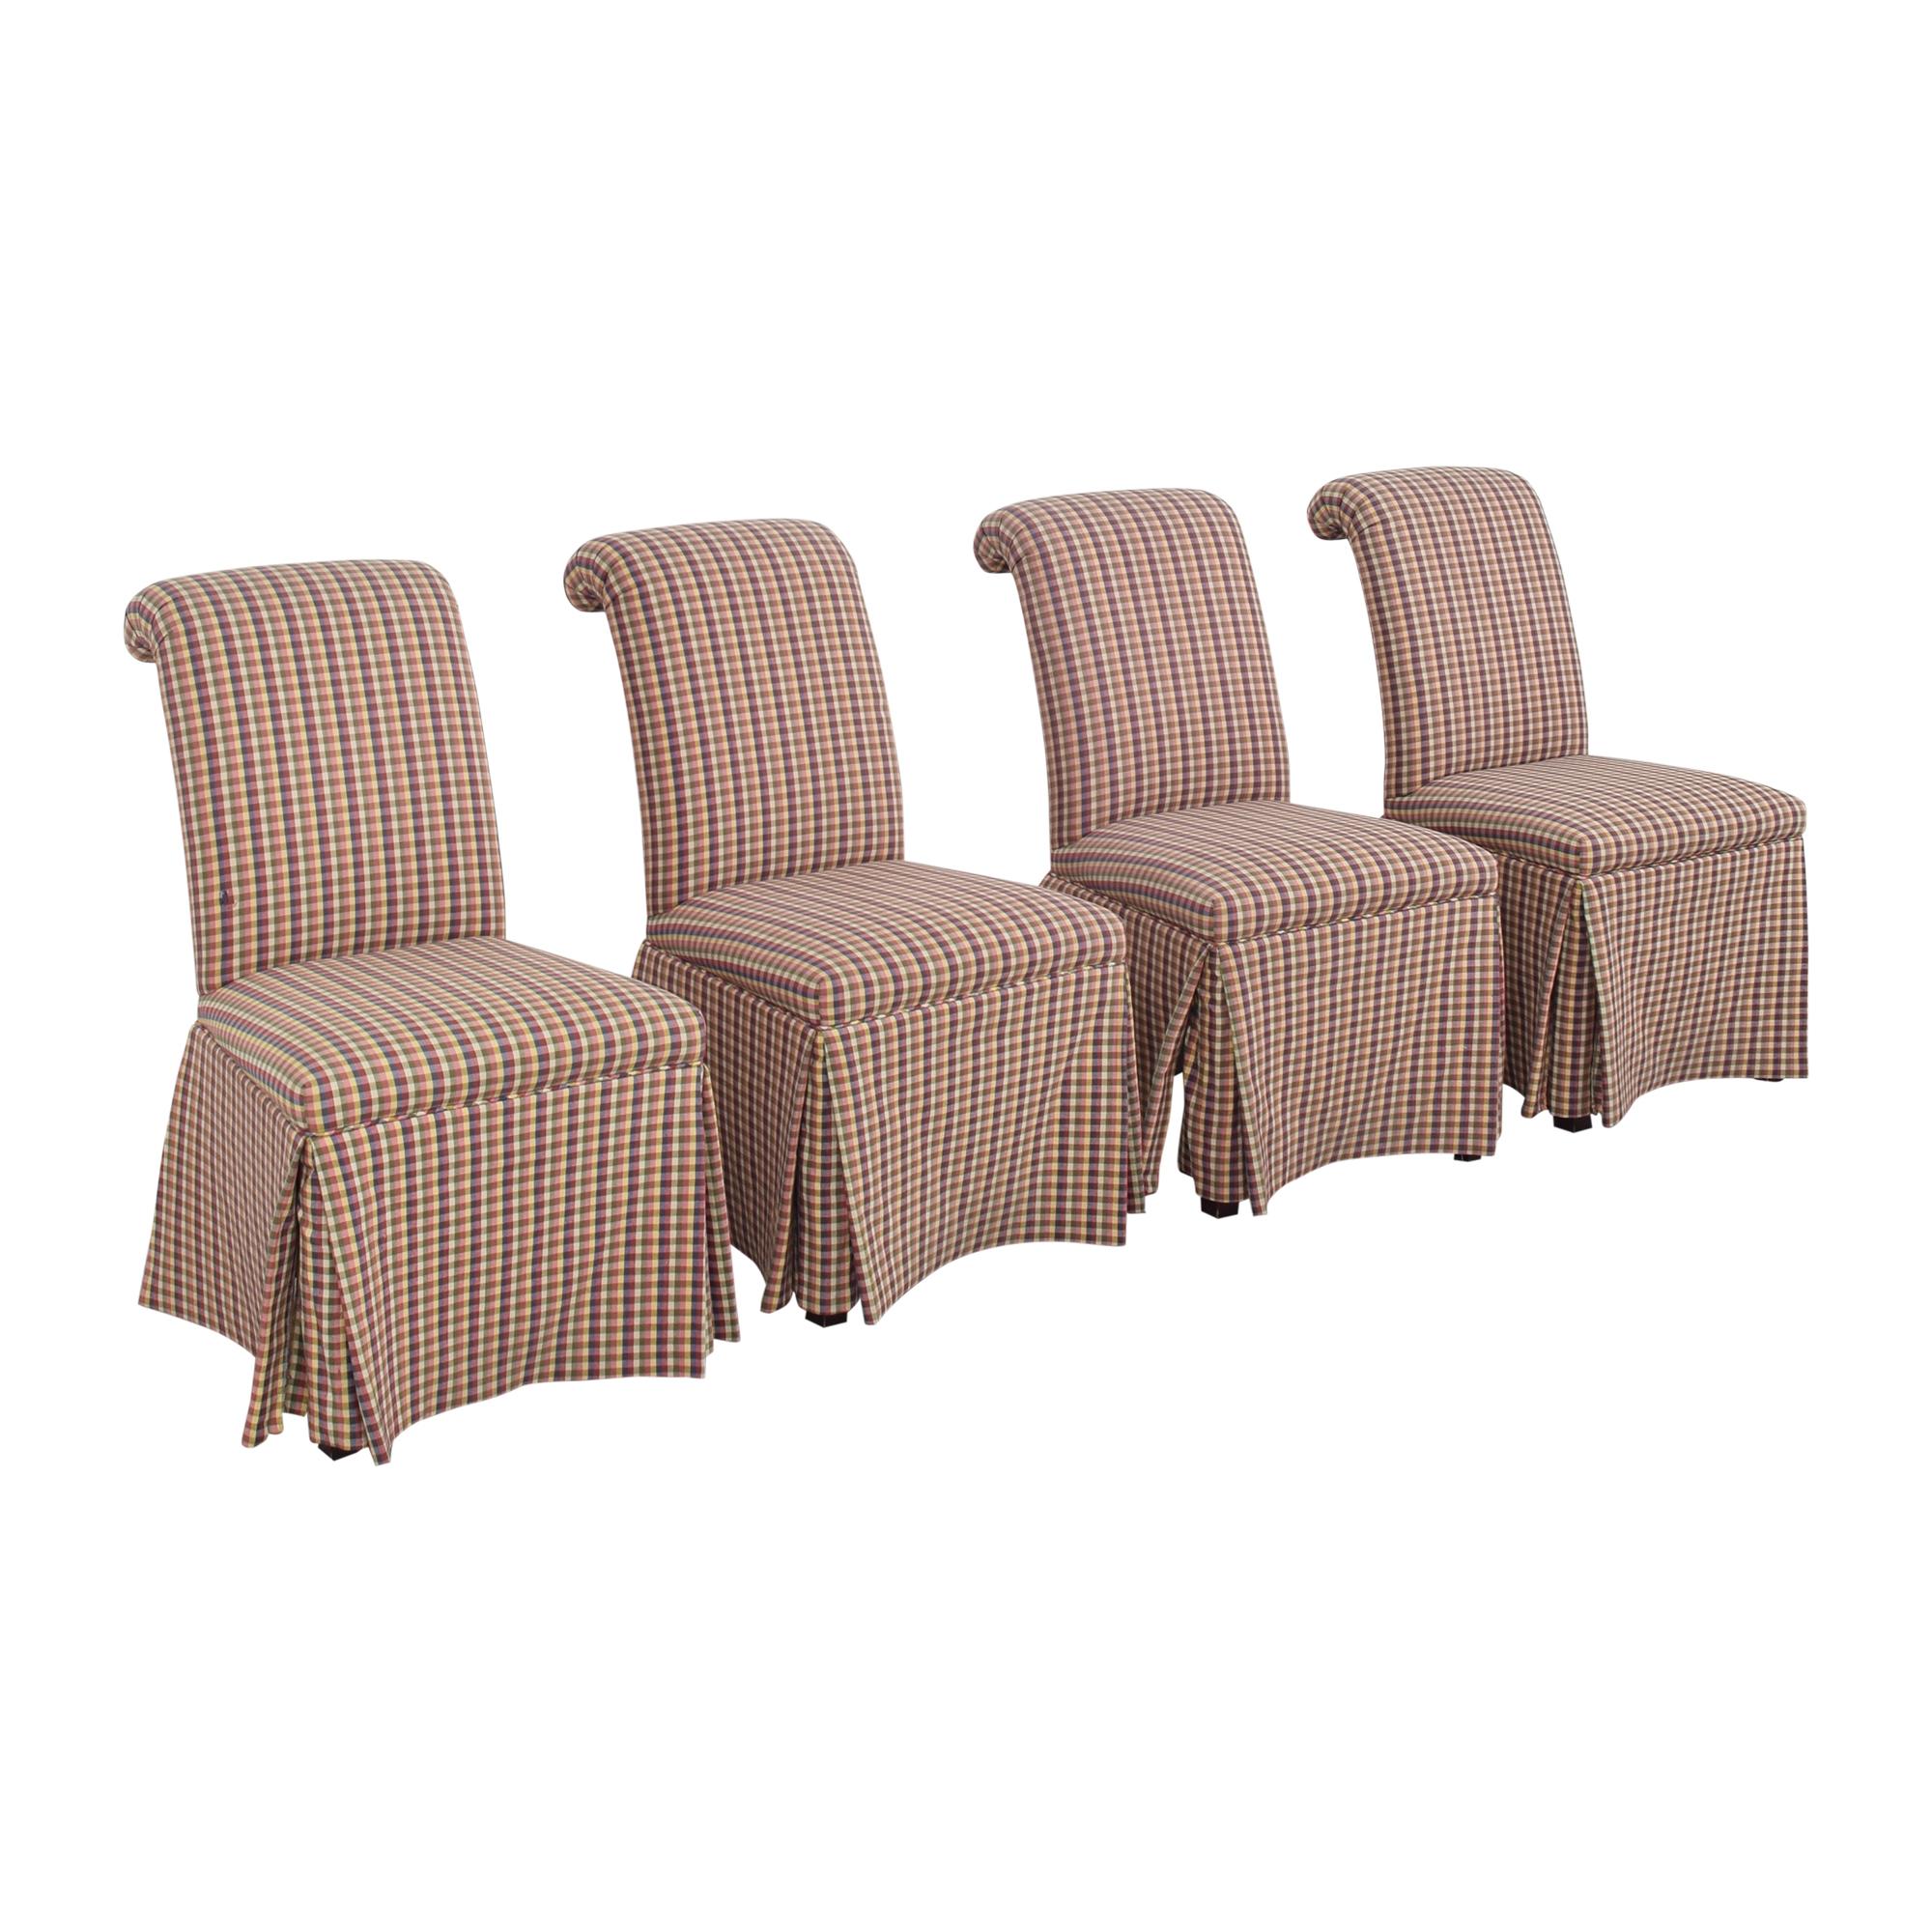 Sherrill Furniture Sherrill Furniture Slipcovered Scroll Top Dining Chairs price